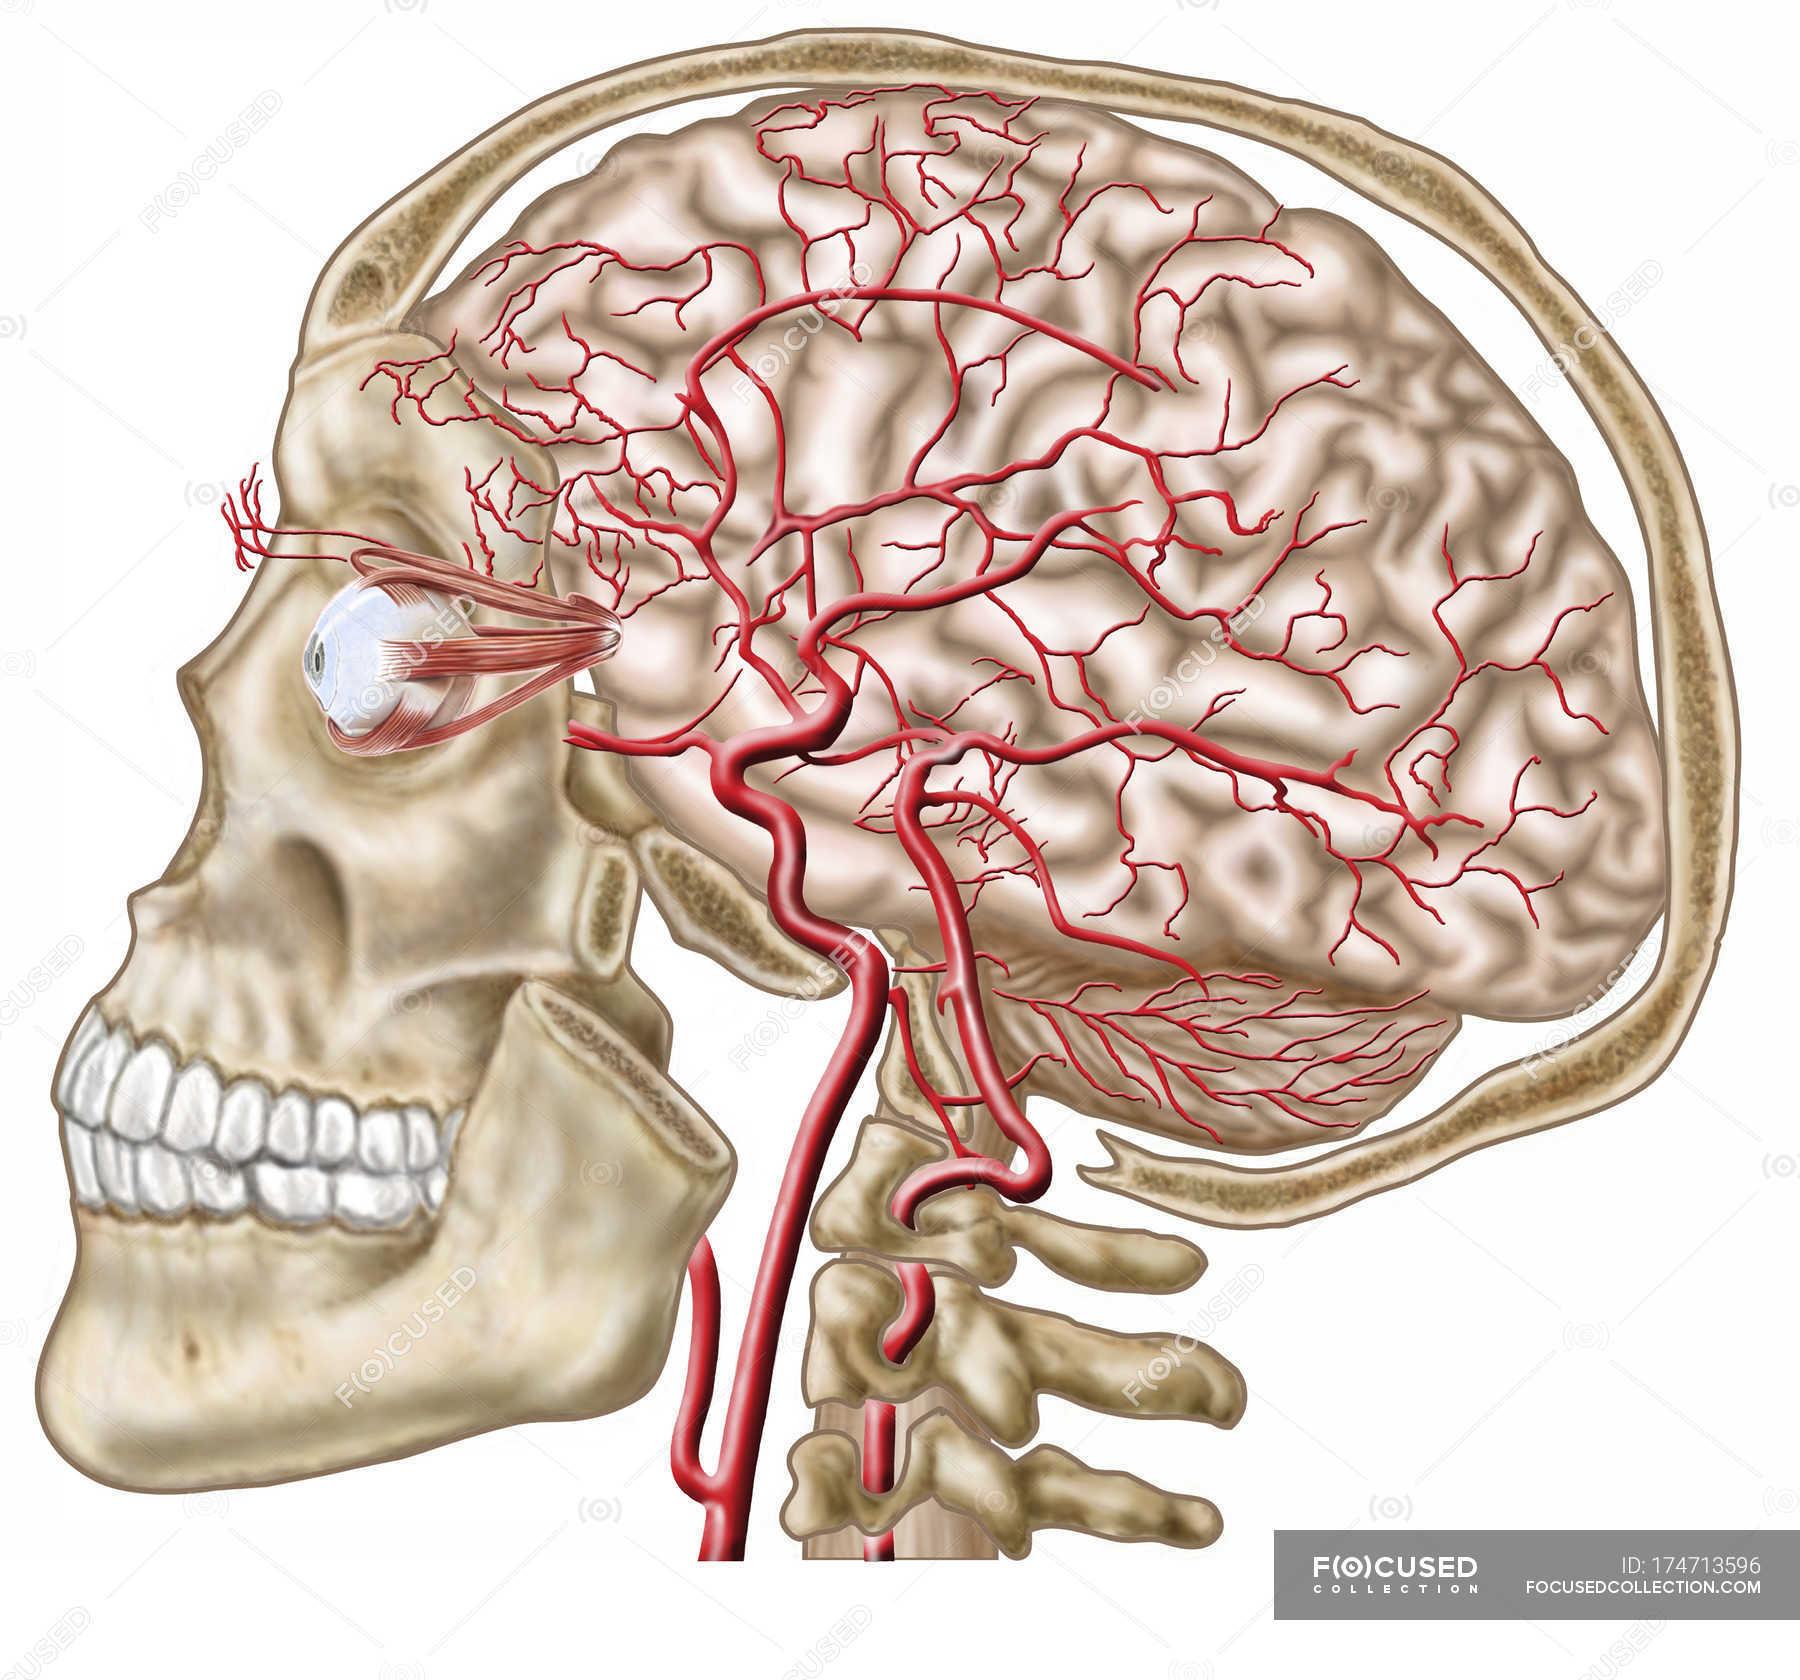 Anatomy Of Human Skull Eyeball And Arteries To Brain Side View